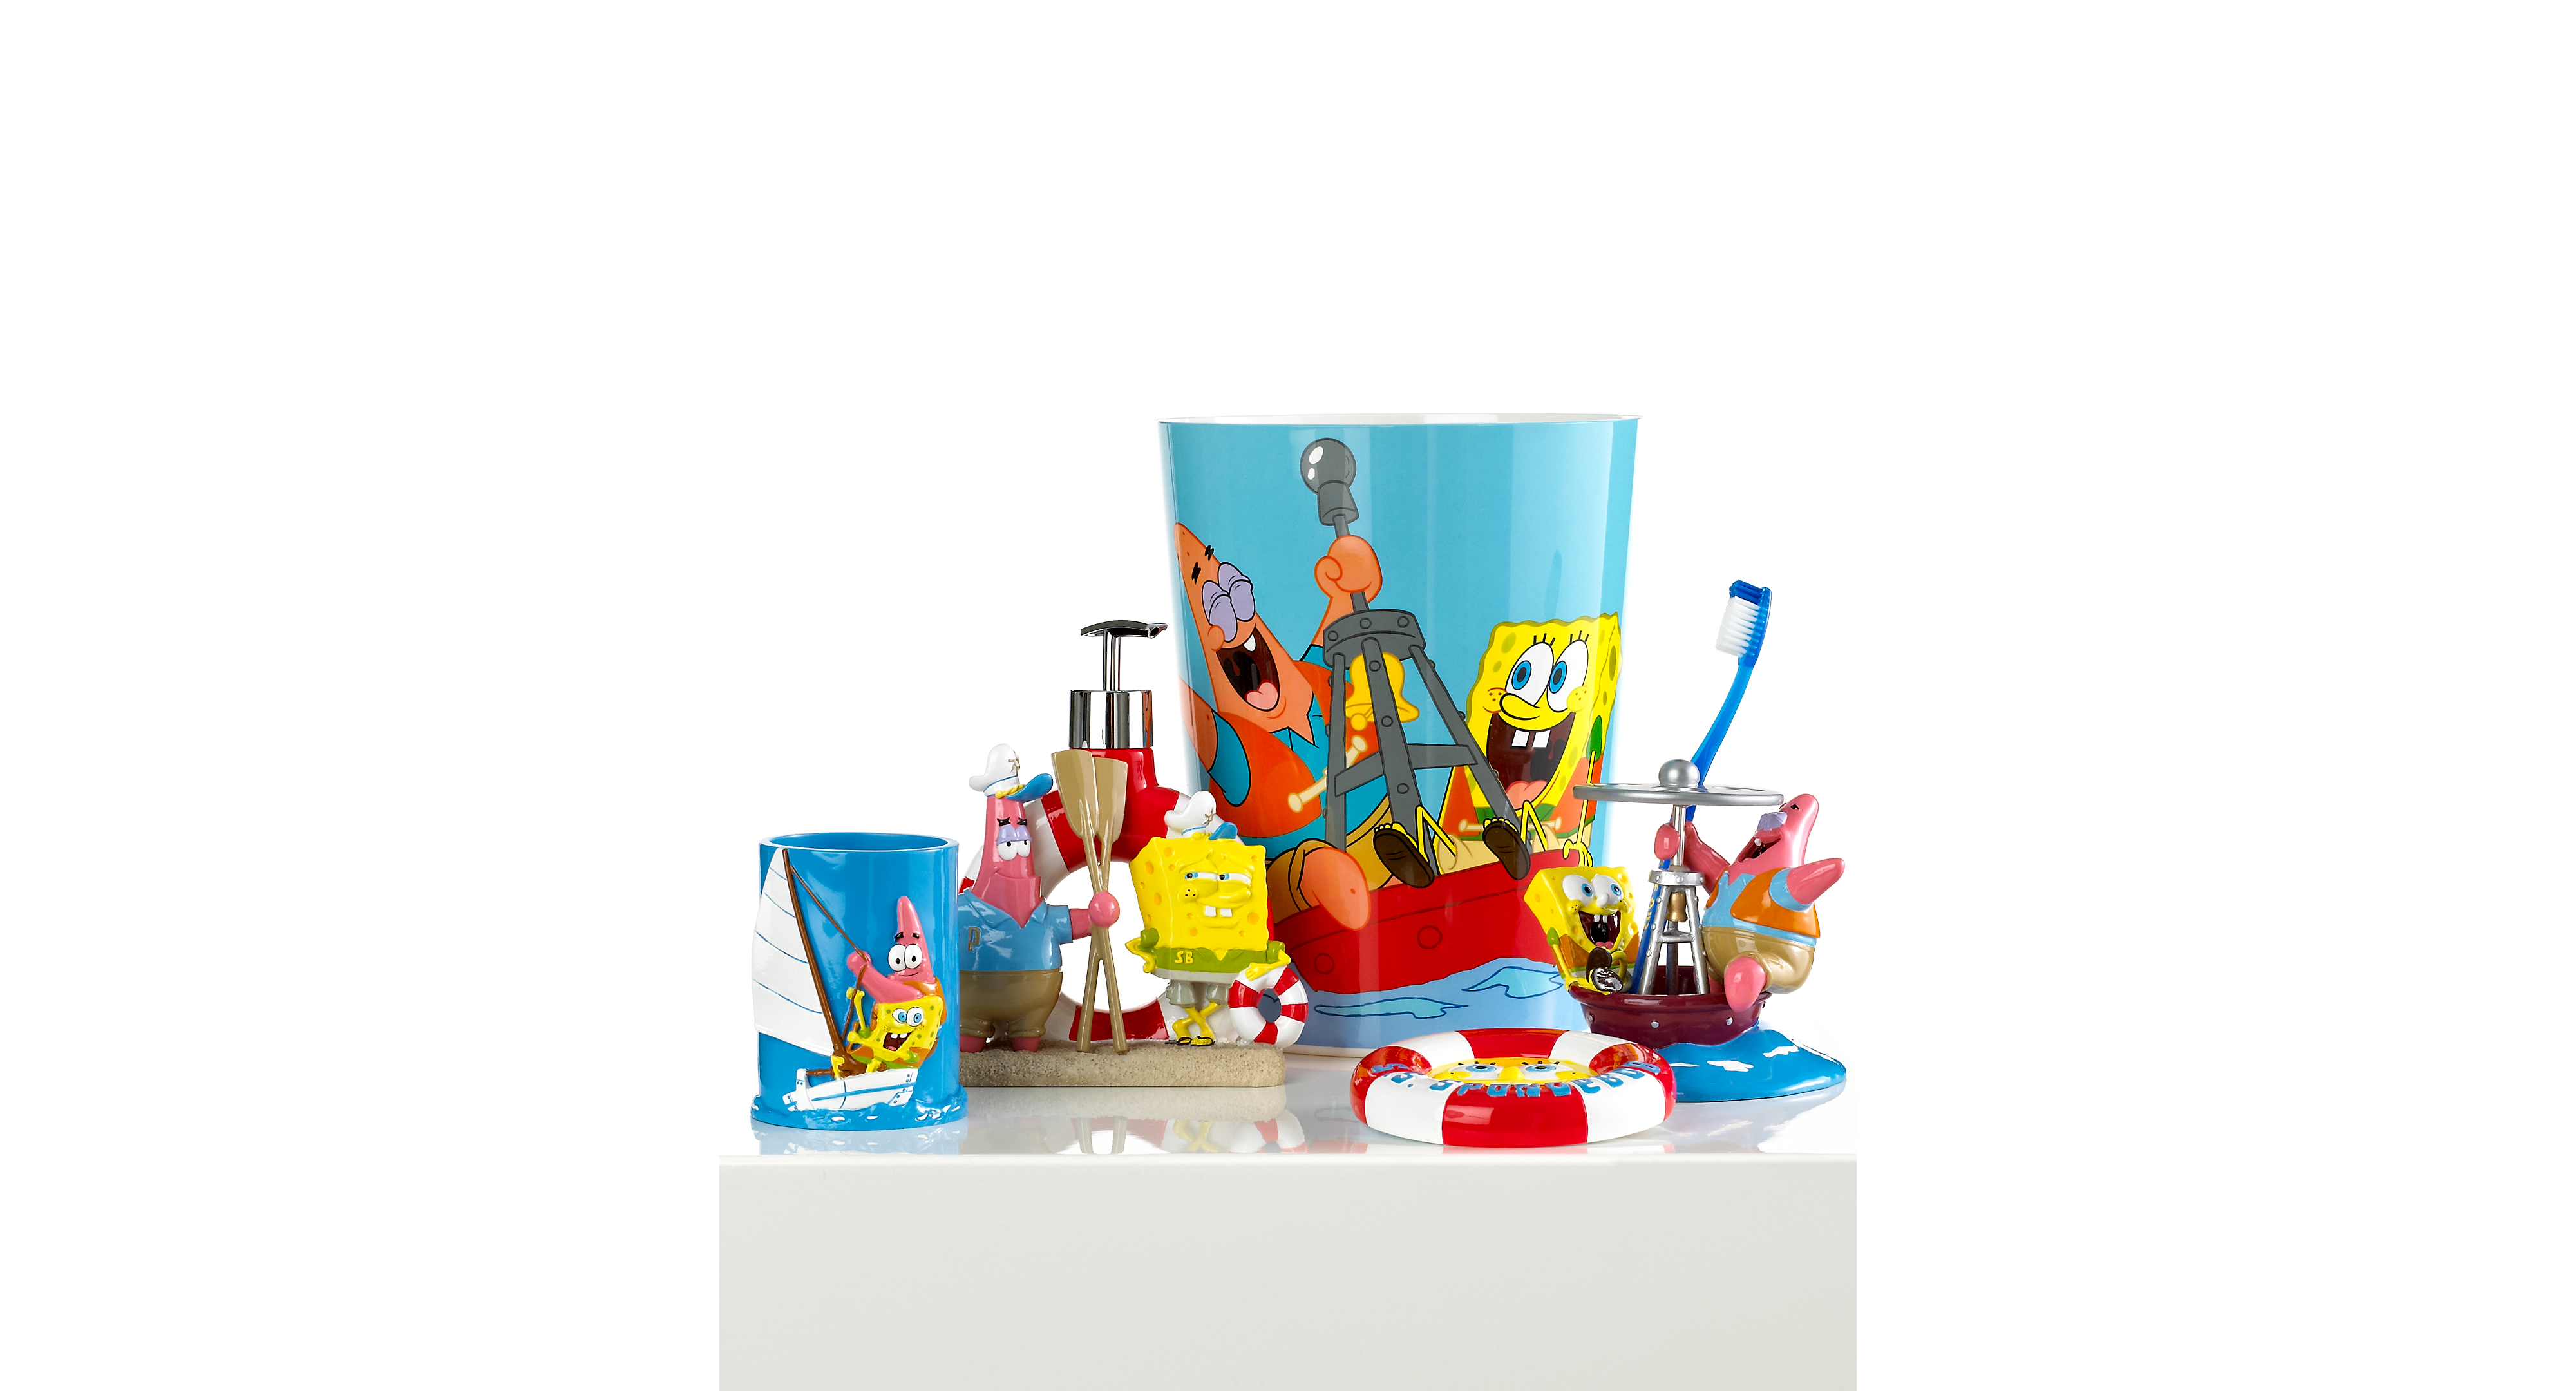 Nickelodeon Bath, Spongebob Set Sail Tumbler | Products | Pinterest ...